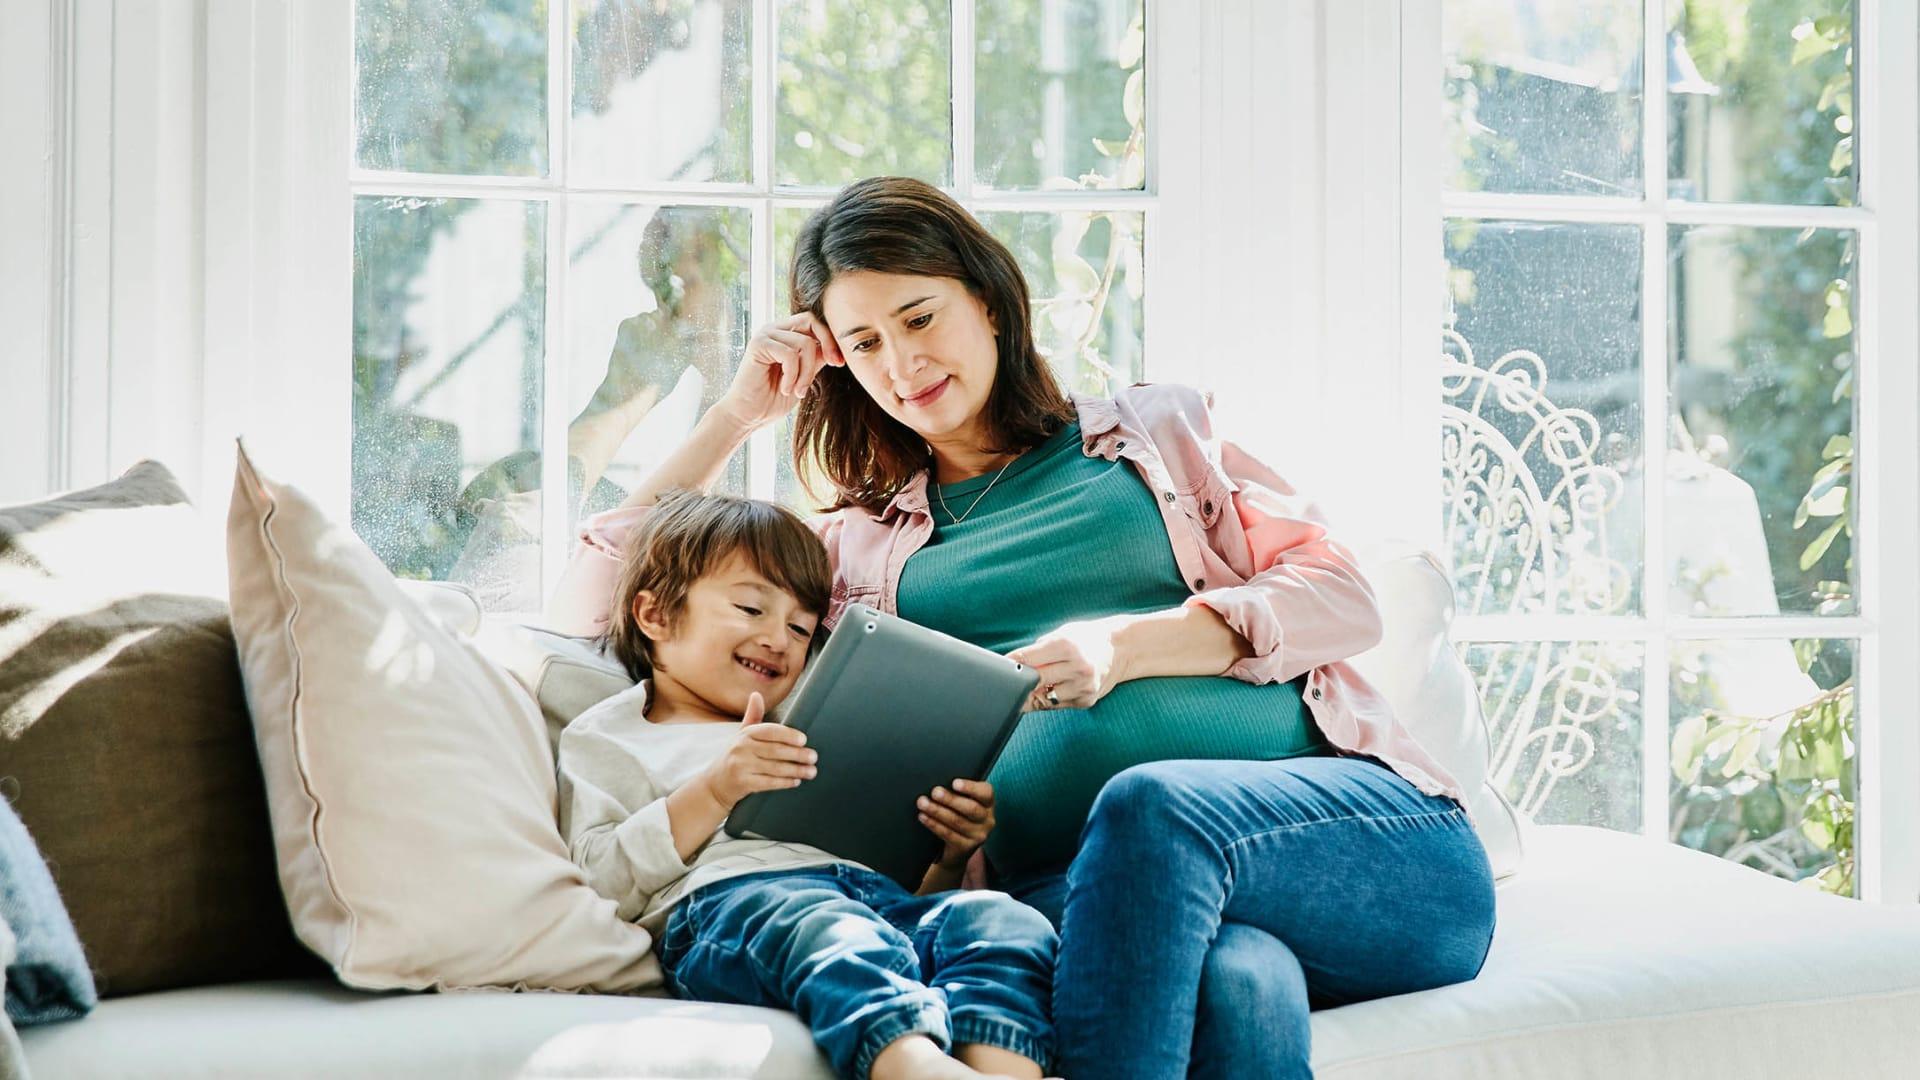 3 Keys to Balancing Demands at Work and Home